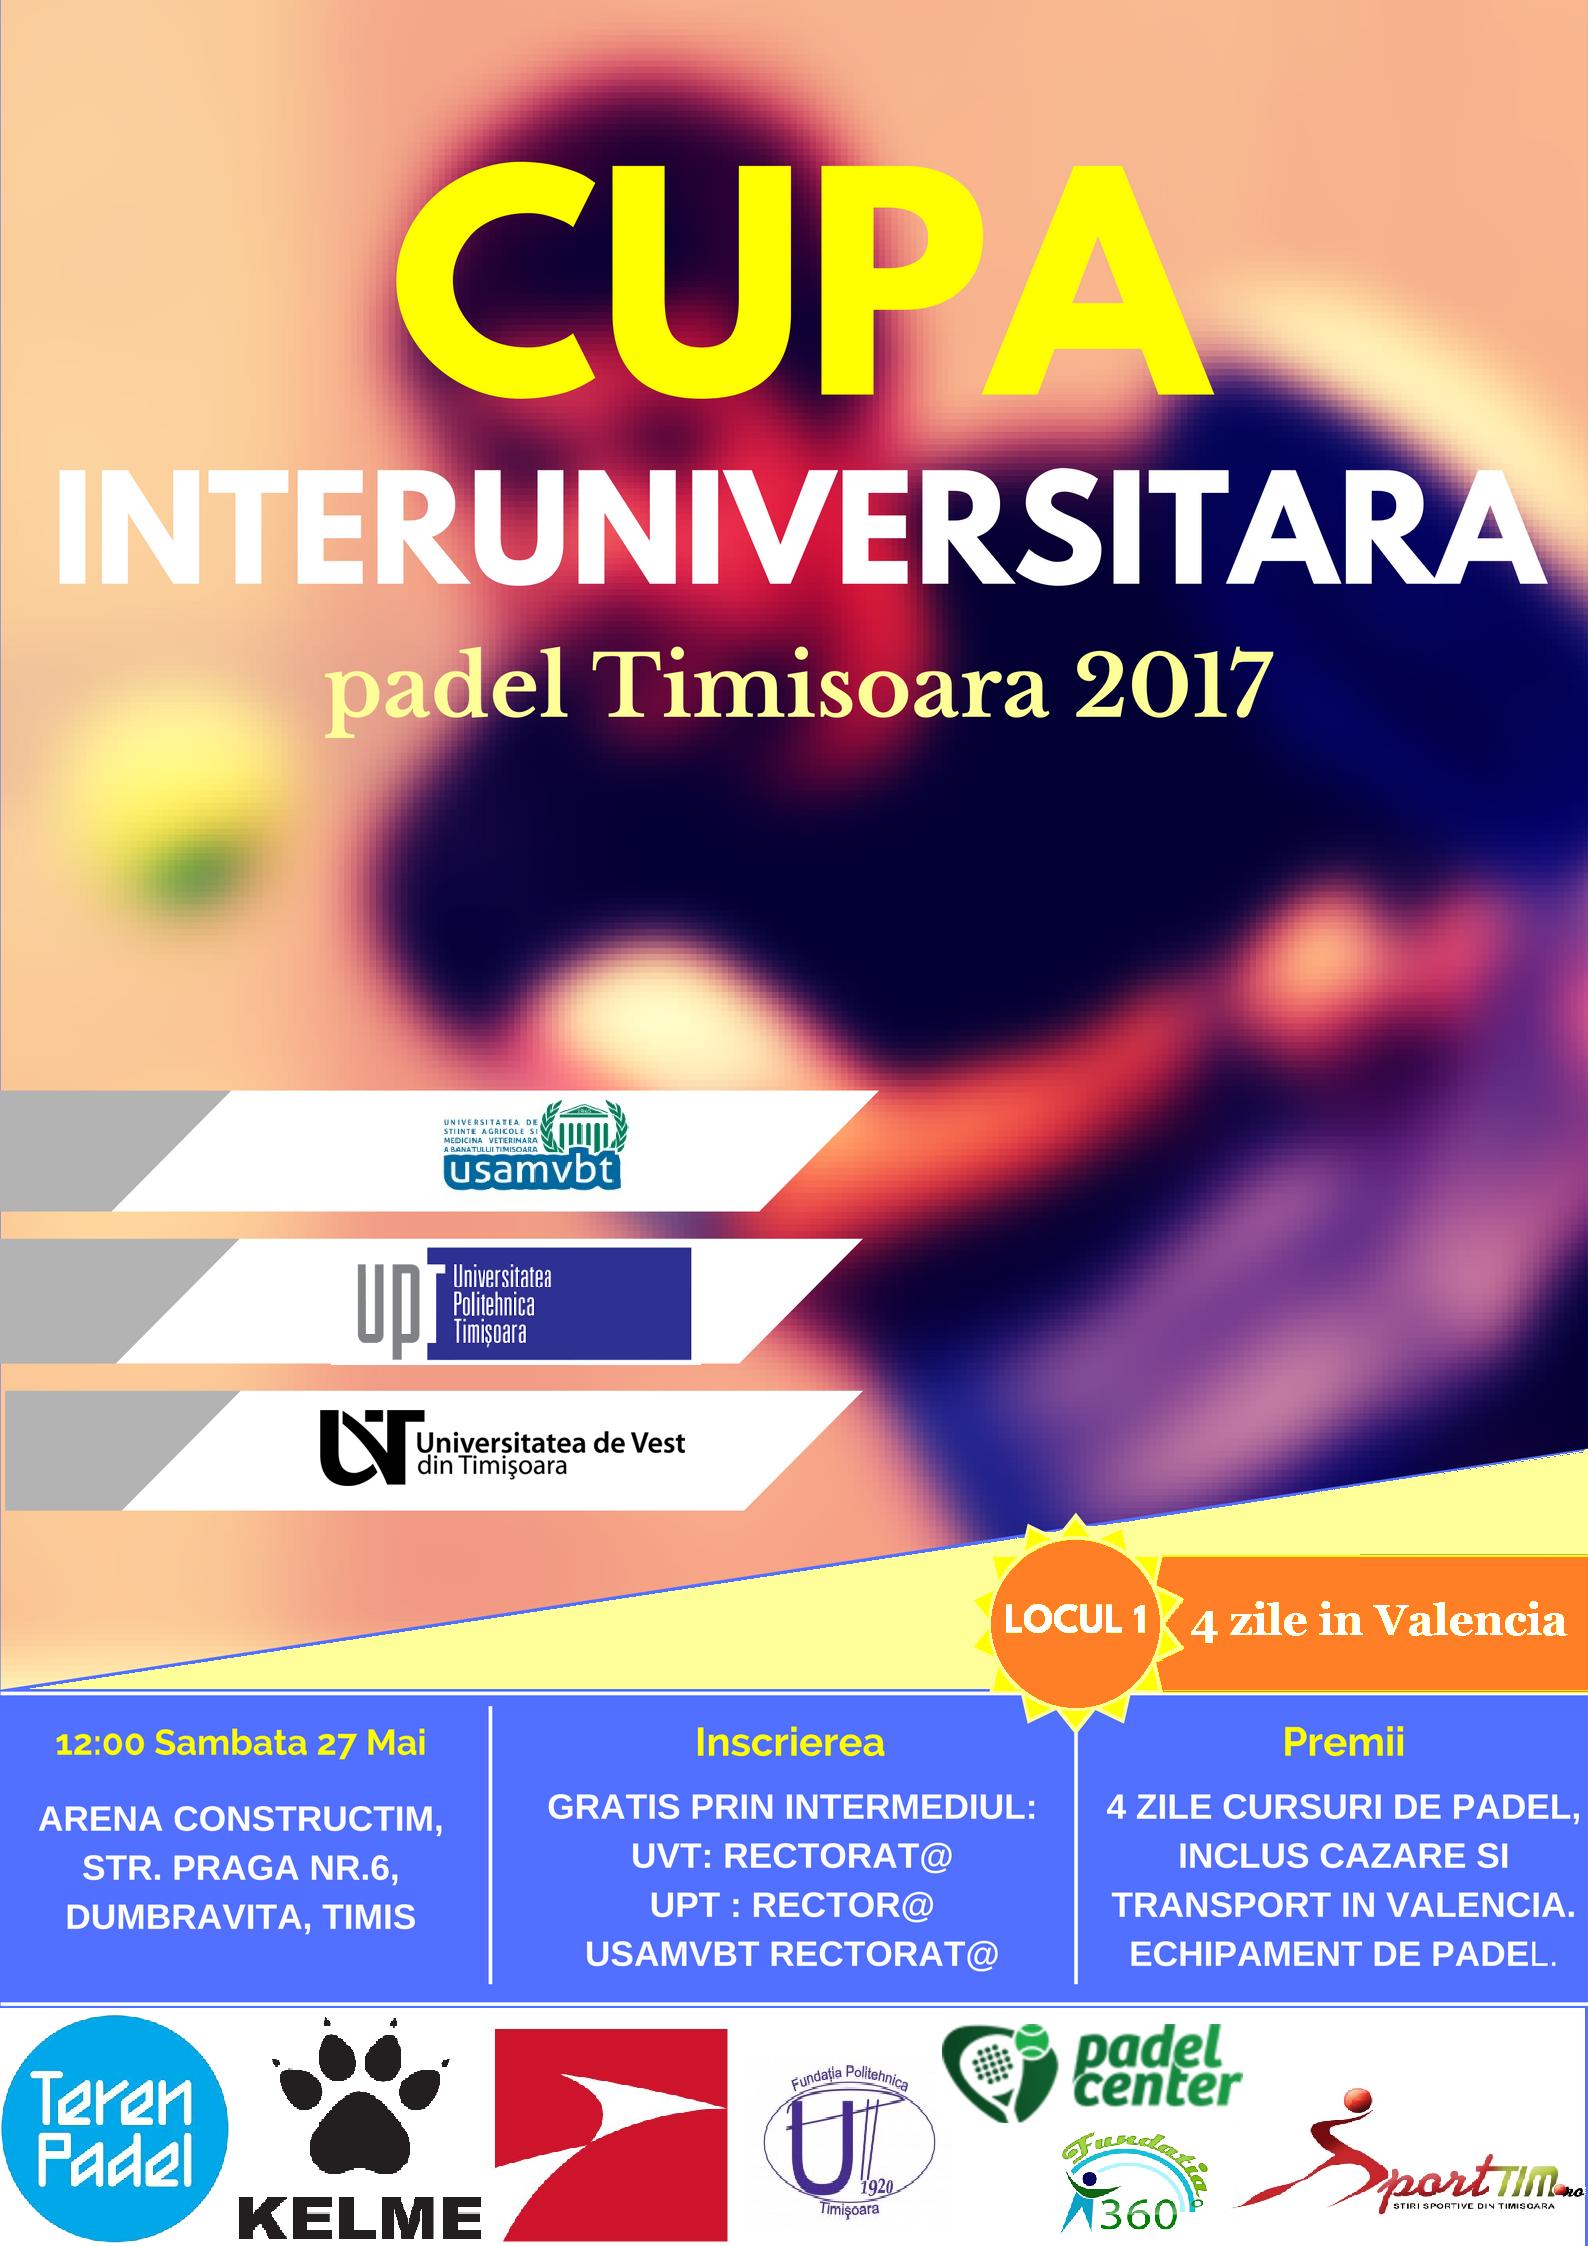 {focus_keyword} Participa la cupa interuniversitara de padel si poti vizita Valencia! afis cupa universit padel